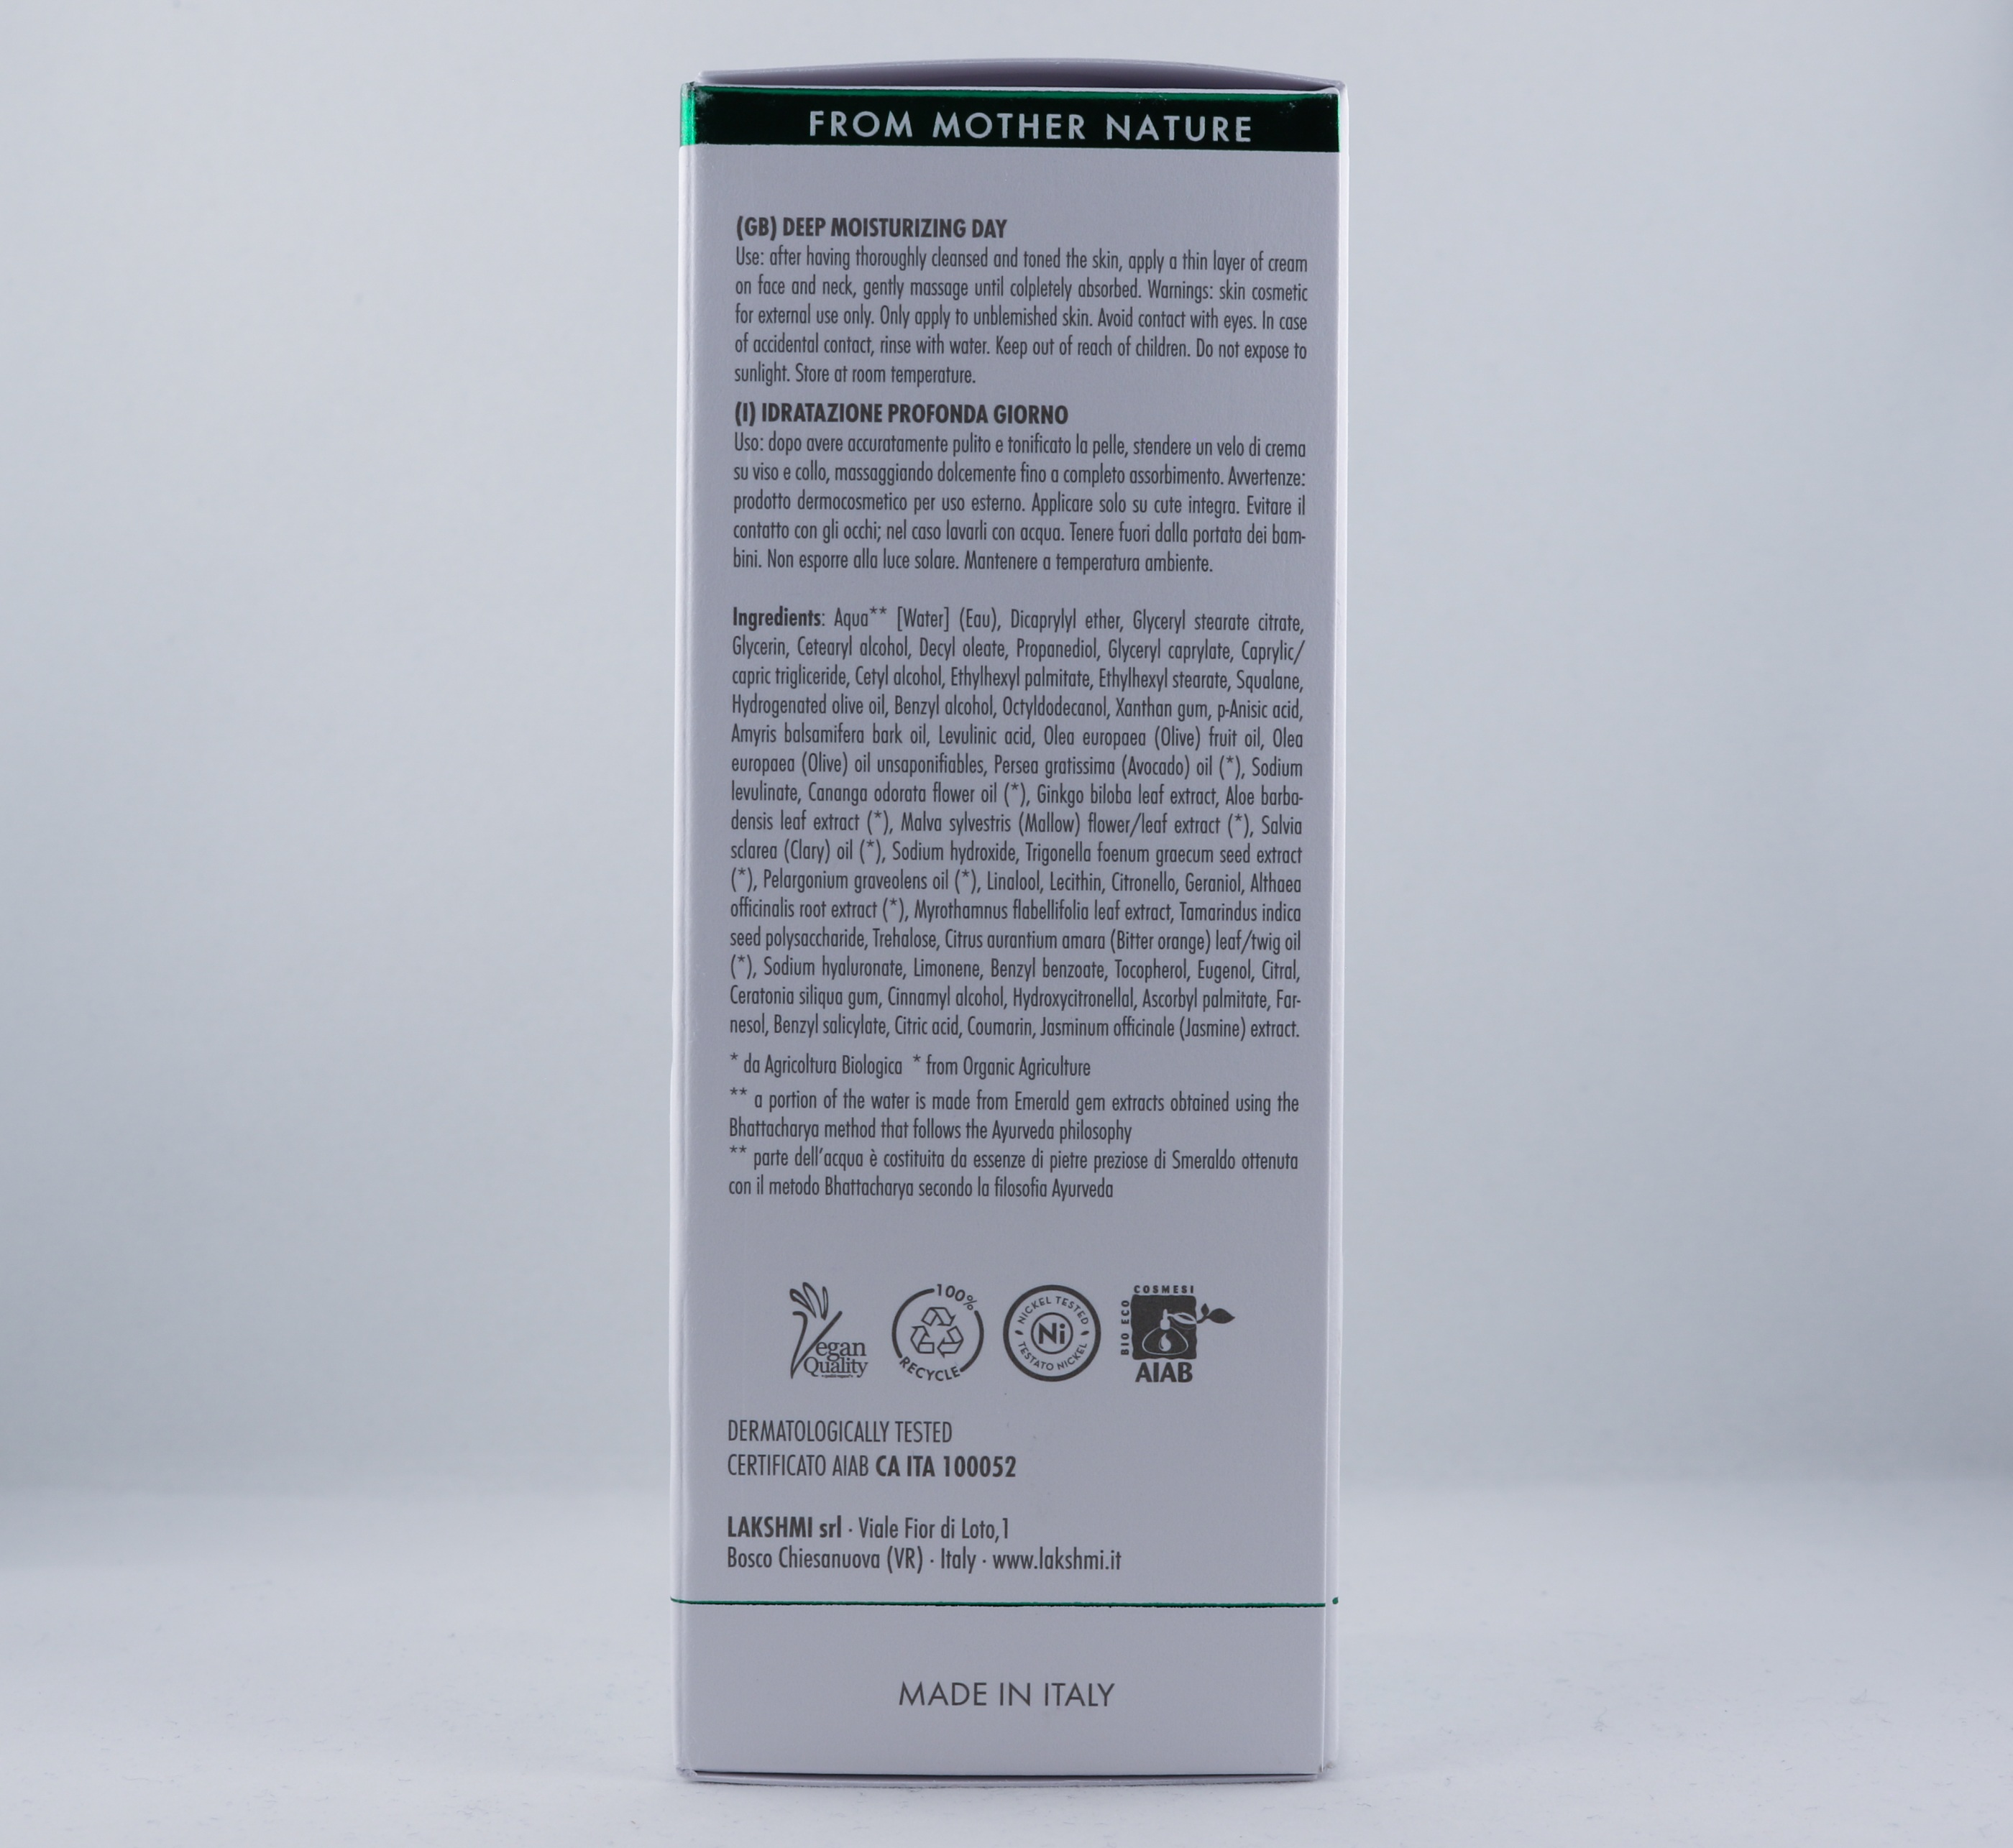 Vata Jasmine Cream hudvårdsprodukt hudvårdstyp alternativ hälsa wellness ayurveda hudvårdsprodukter